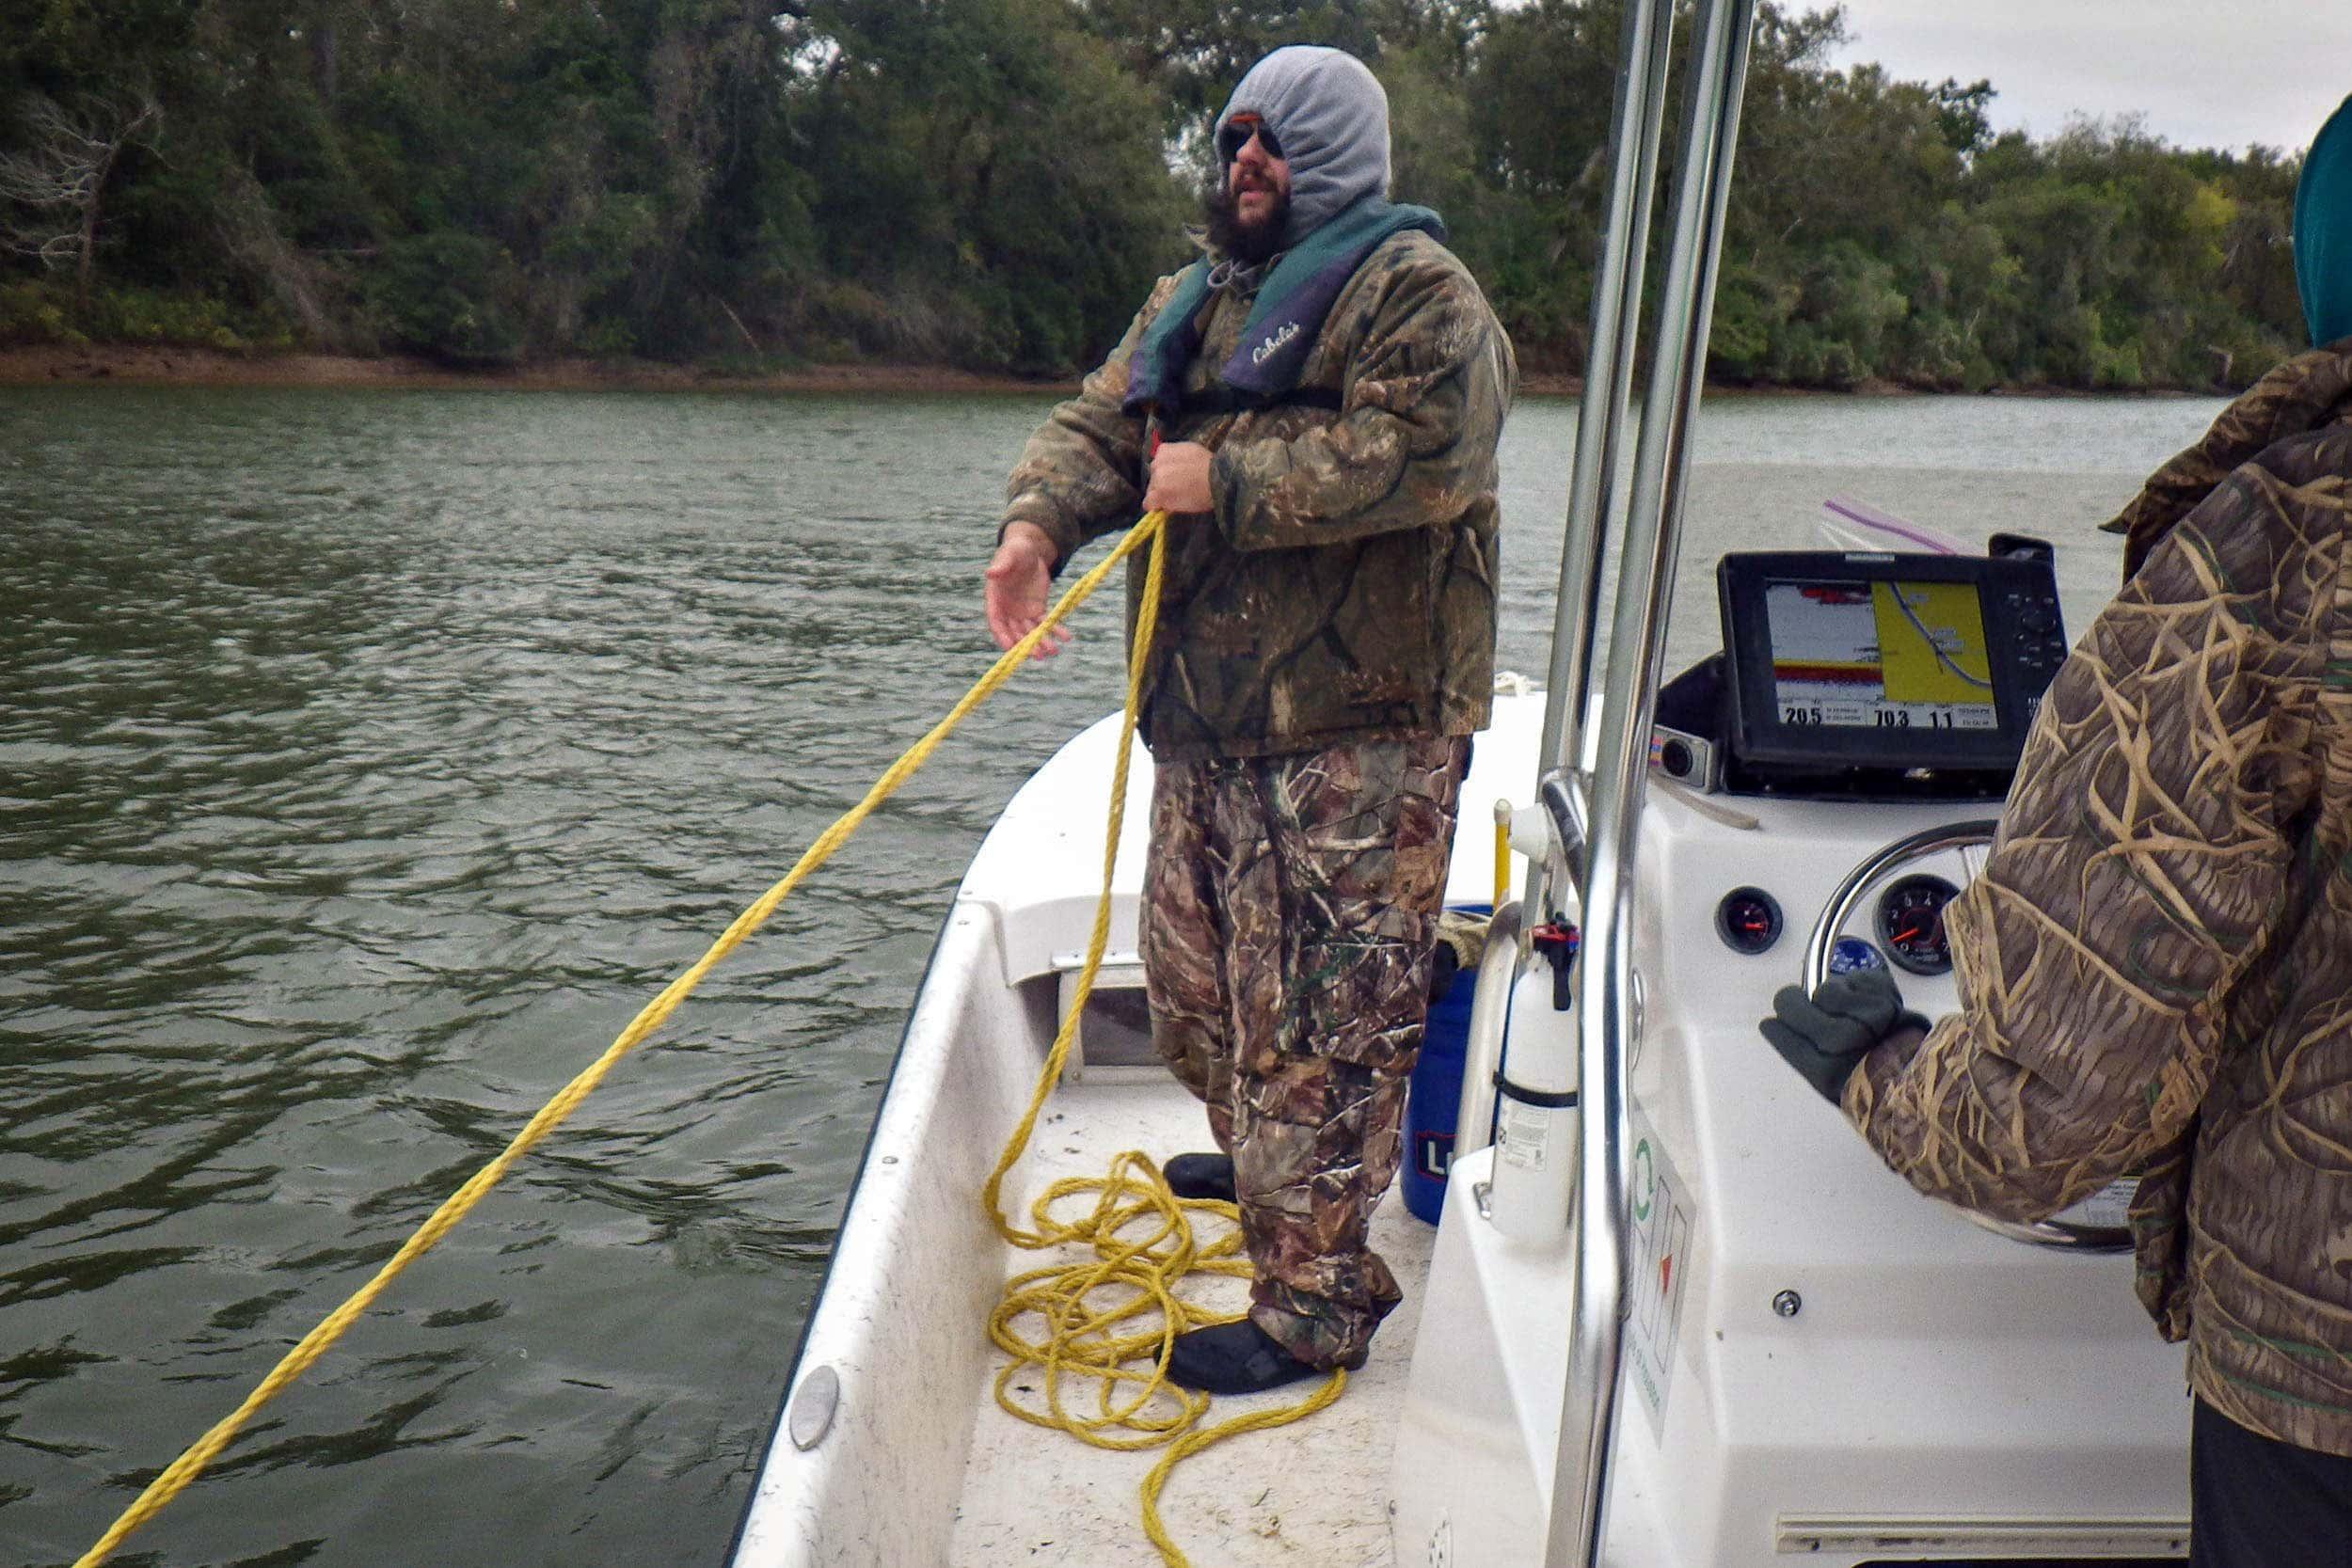 Bryan Alleman retrieves the otter trawl